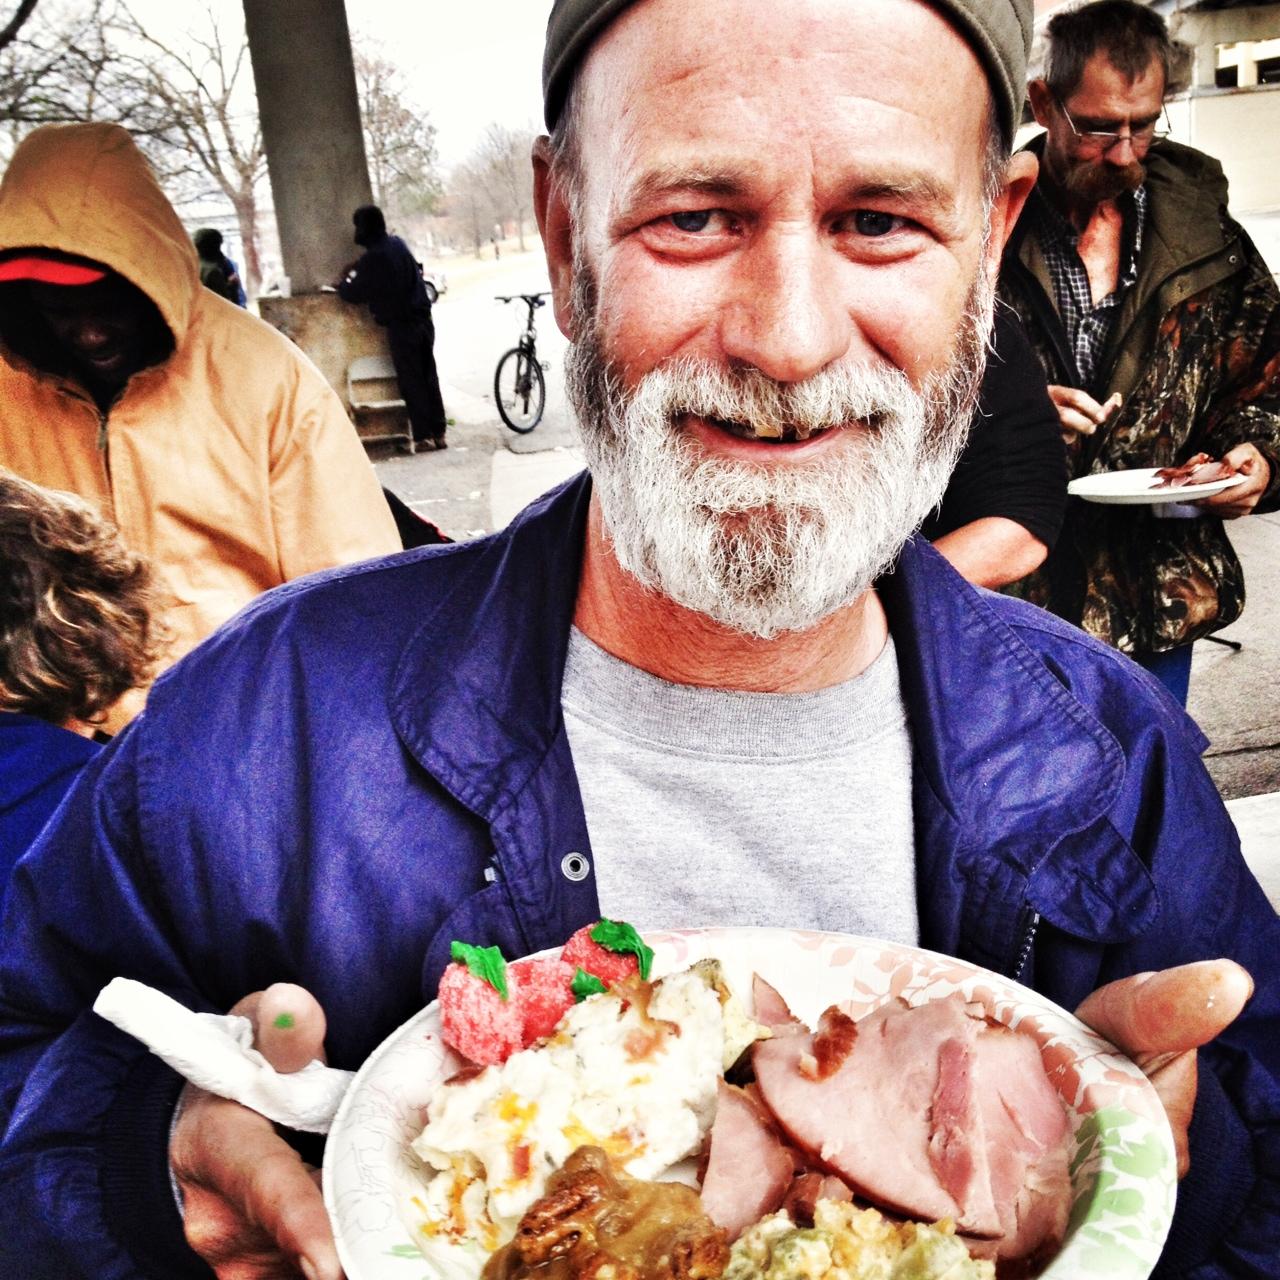 homeless man with plate of christmas dinner, under the bridge, feeding the homeless